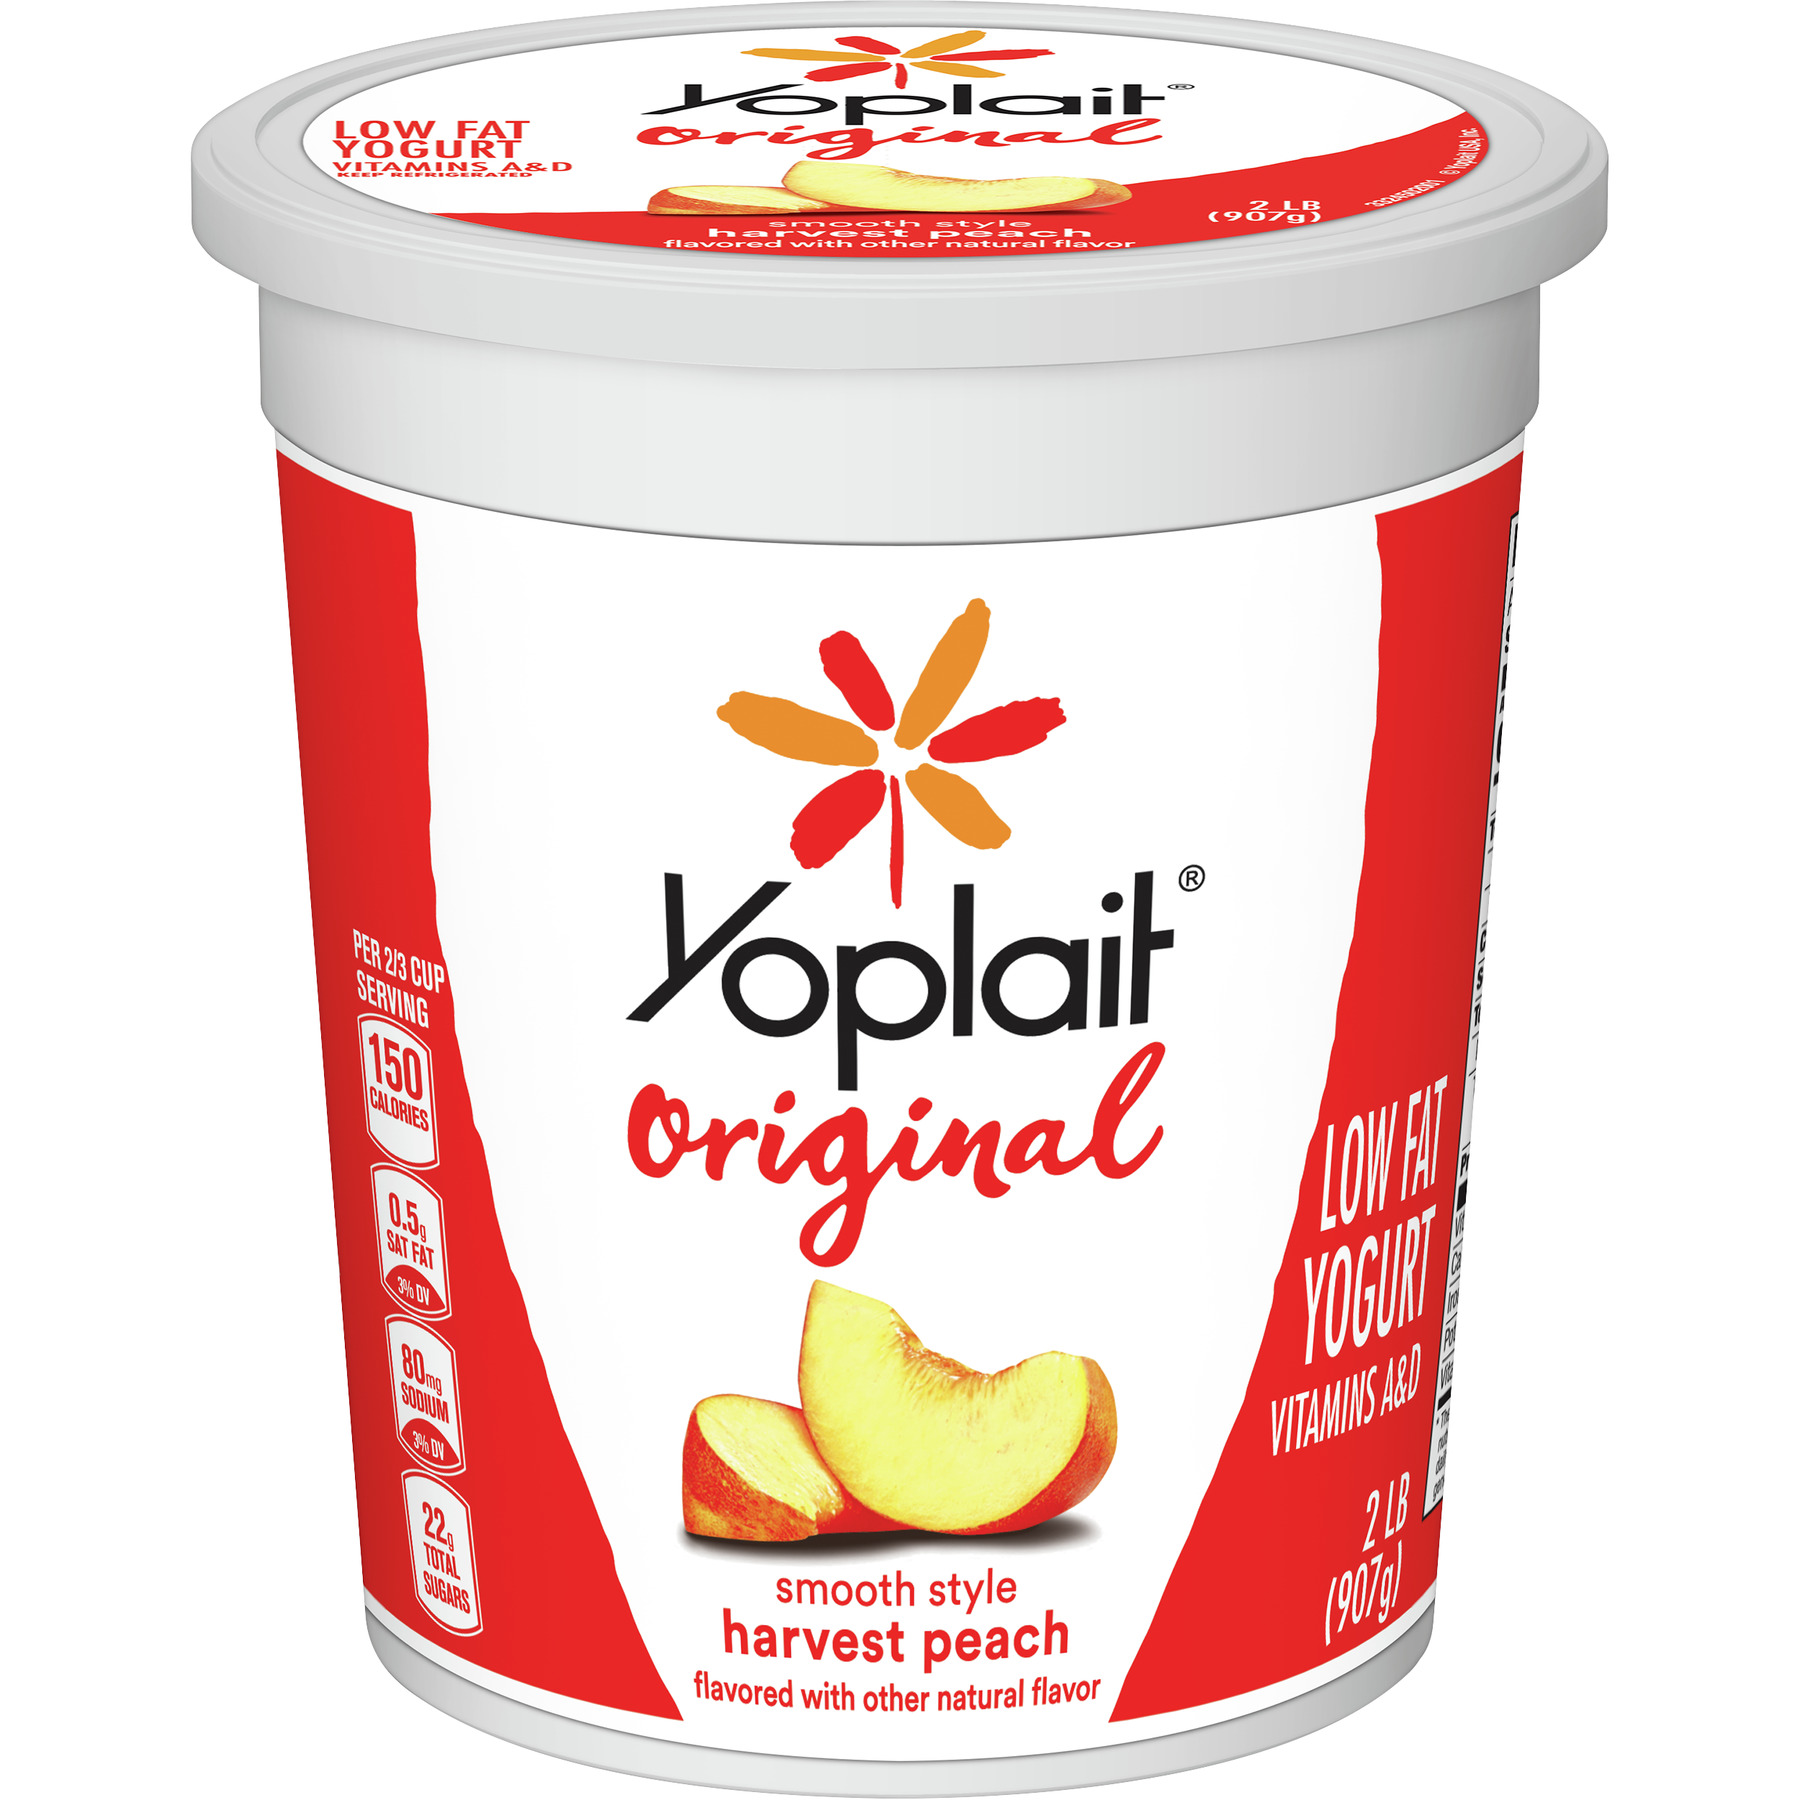 » When It Comes to Yogurt, Size and Ingredients Matter |Yoplait Yogurt Ingredients